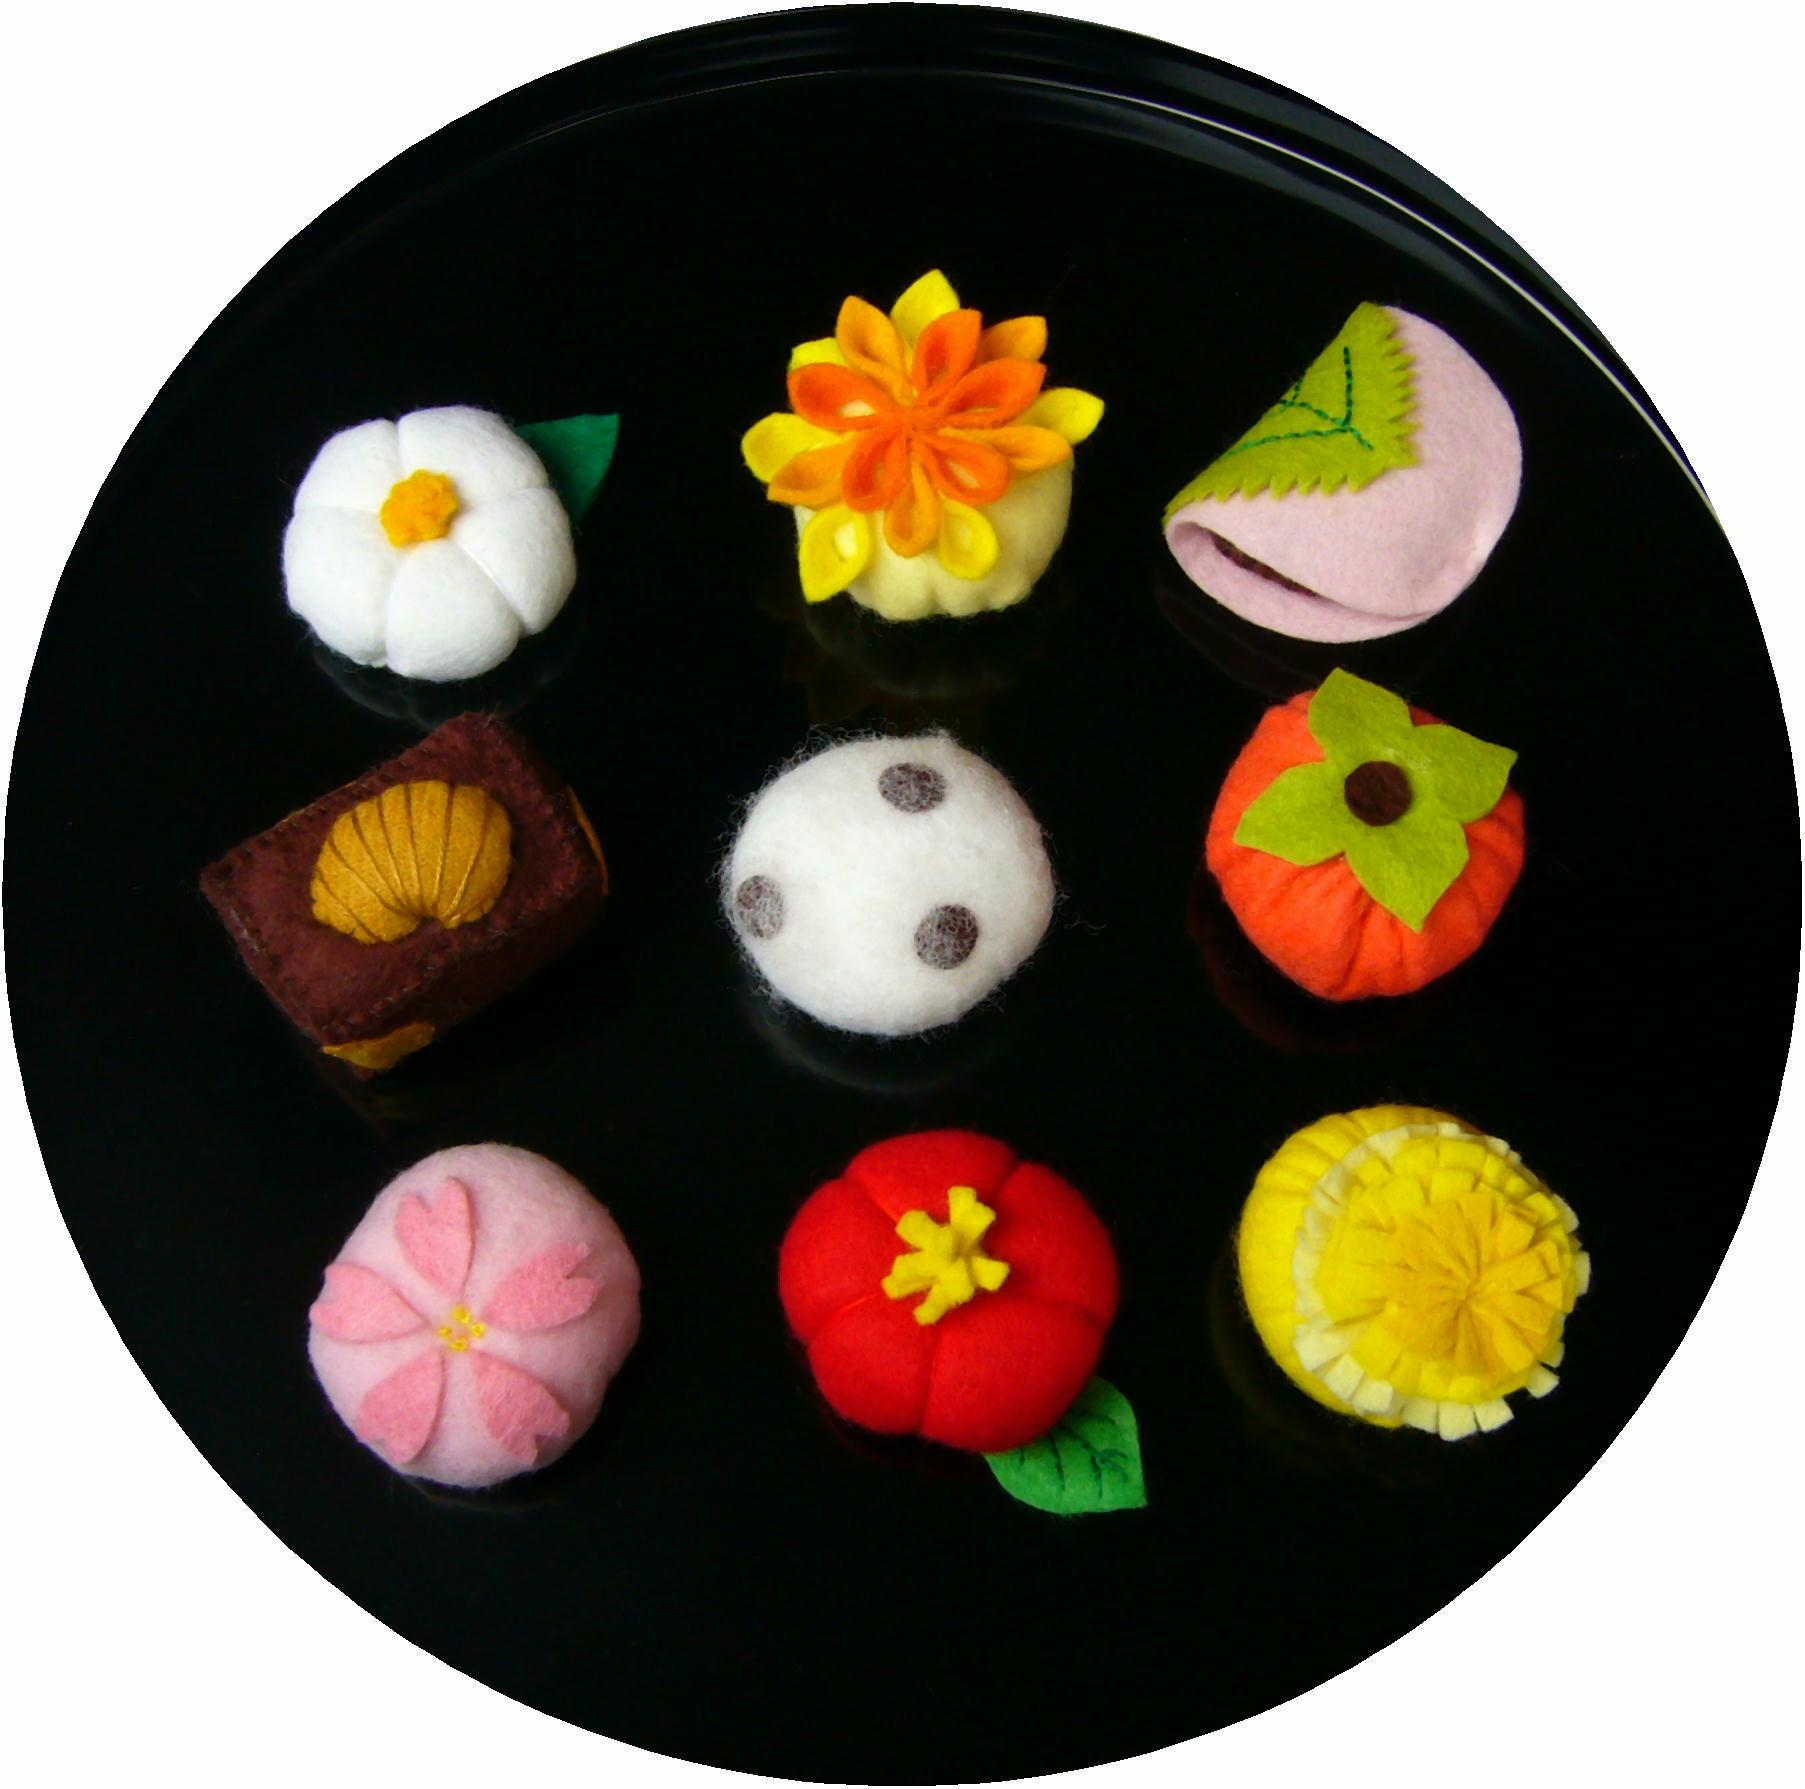 Wagashi Sweets : 2014の干支 : すべての講義